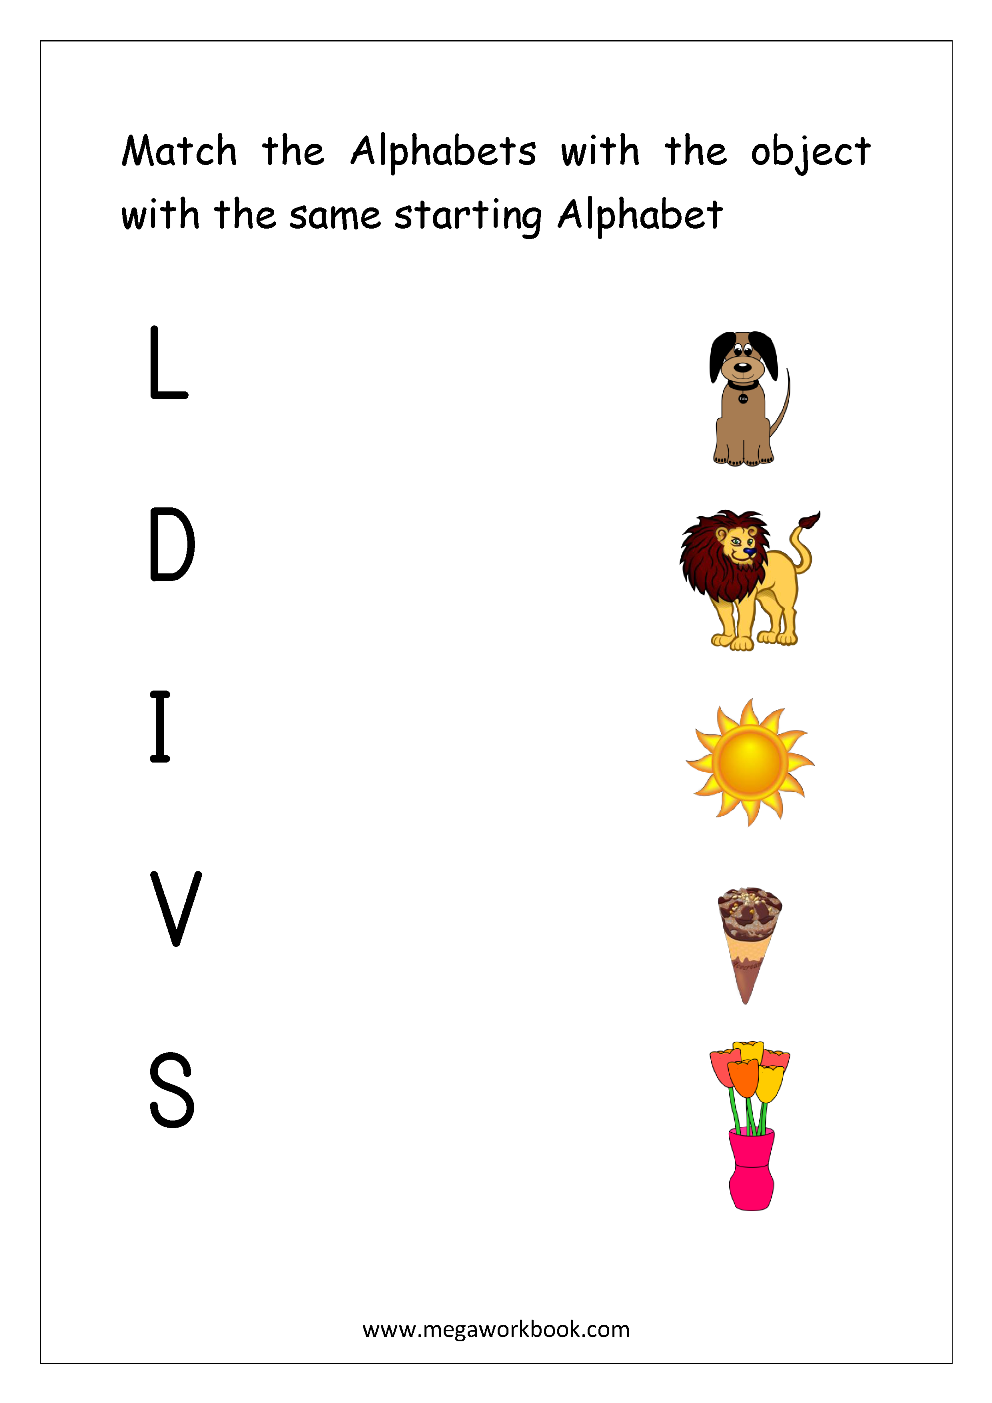 Free English Worksheets Alphabet Matching Megaworkbook